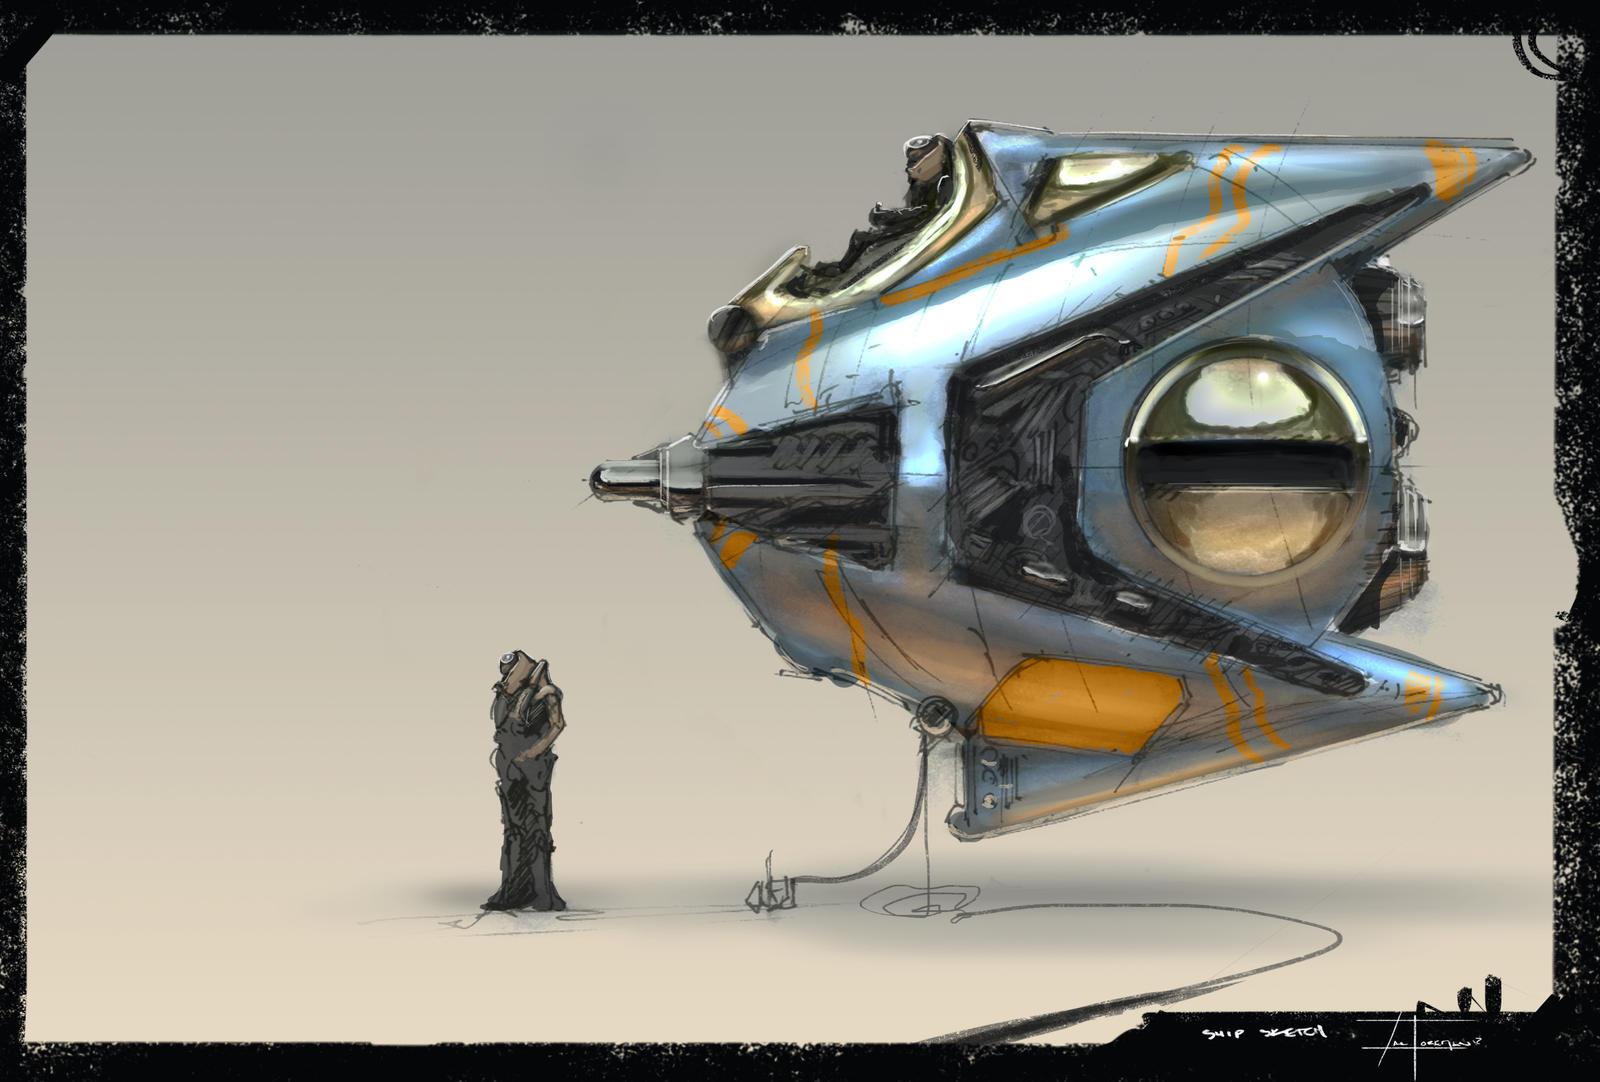 11-15-12 (ship sketch) by zakforeman